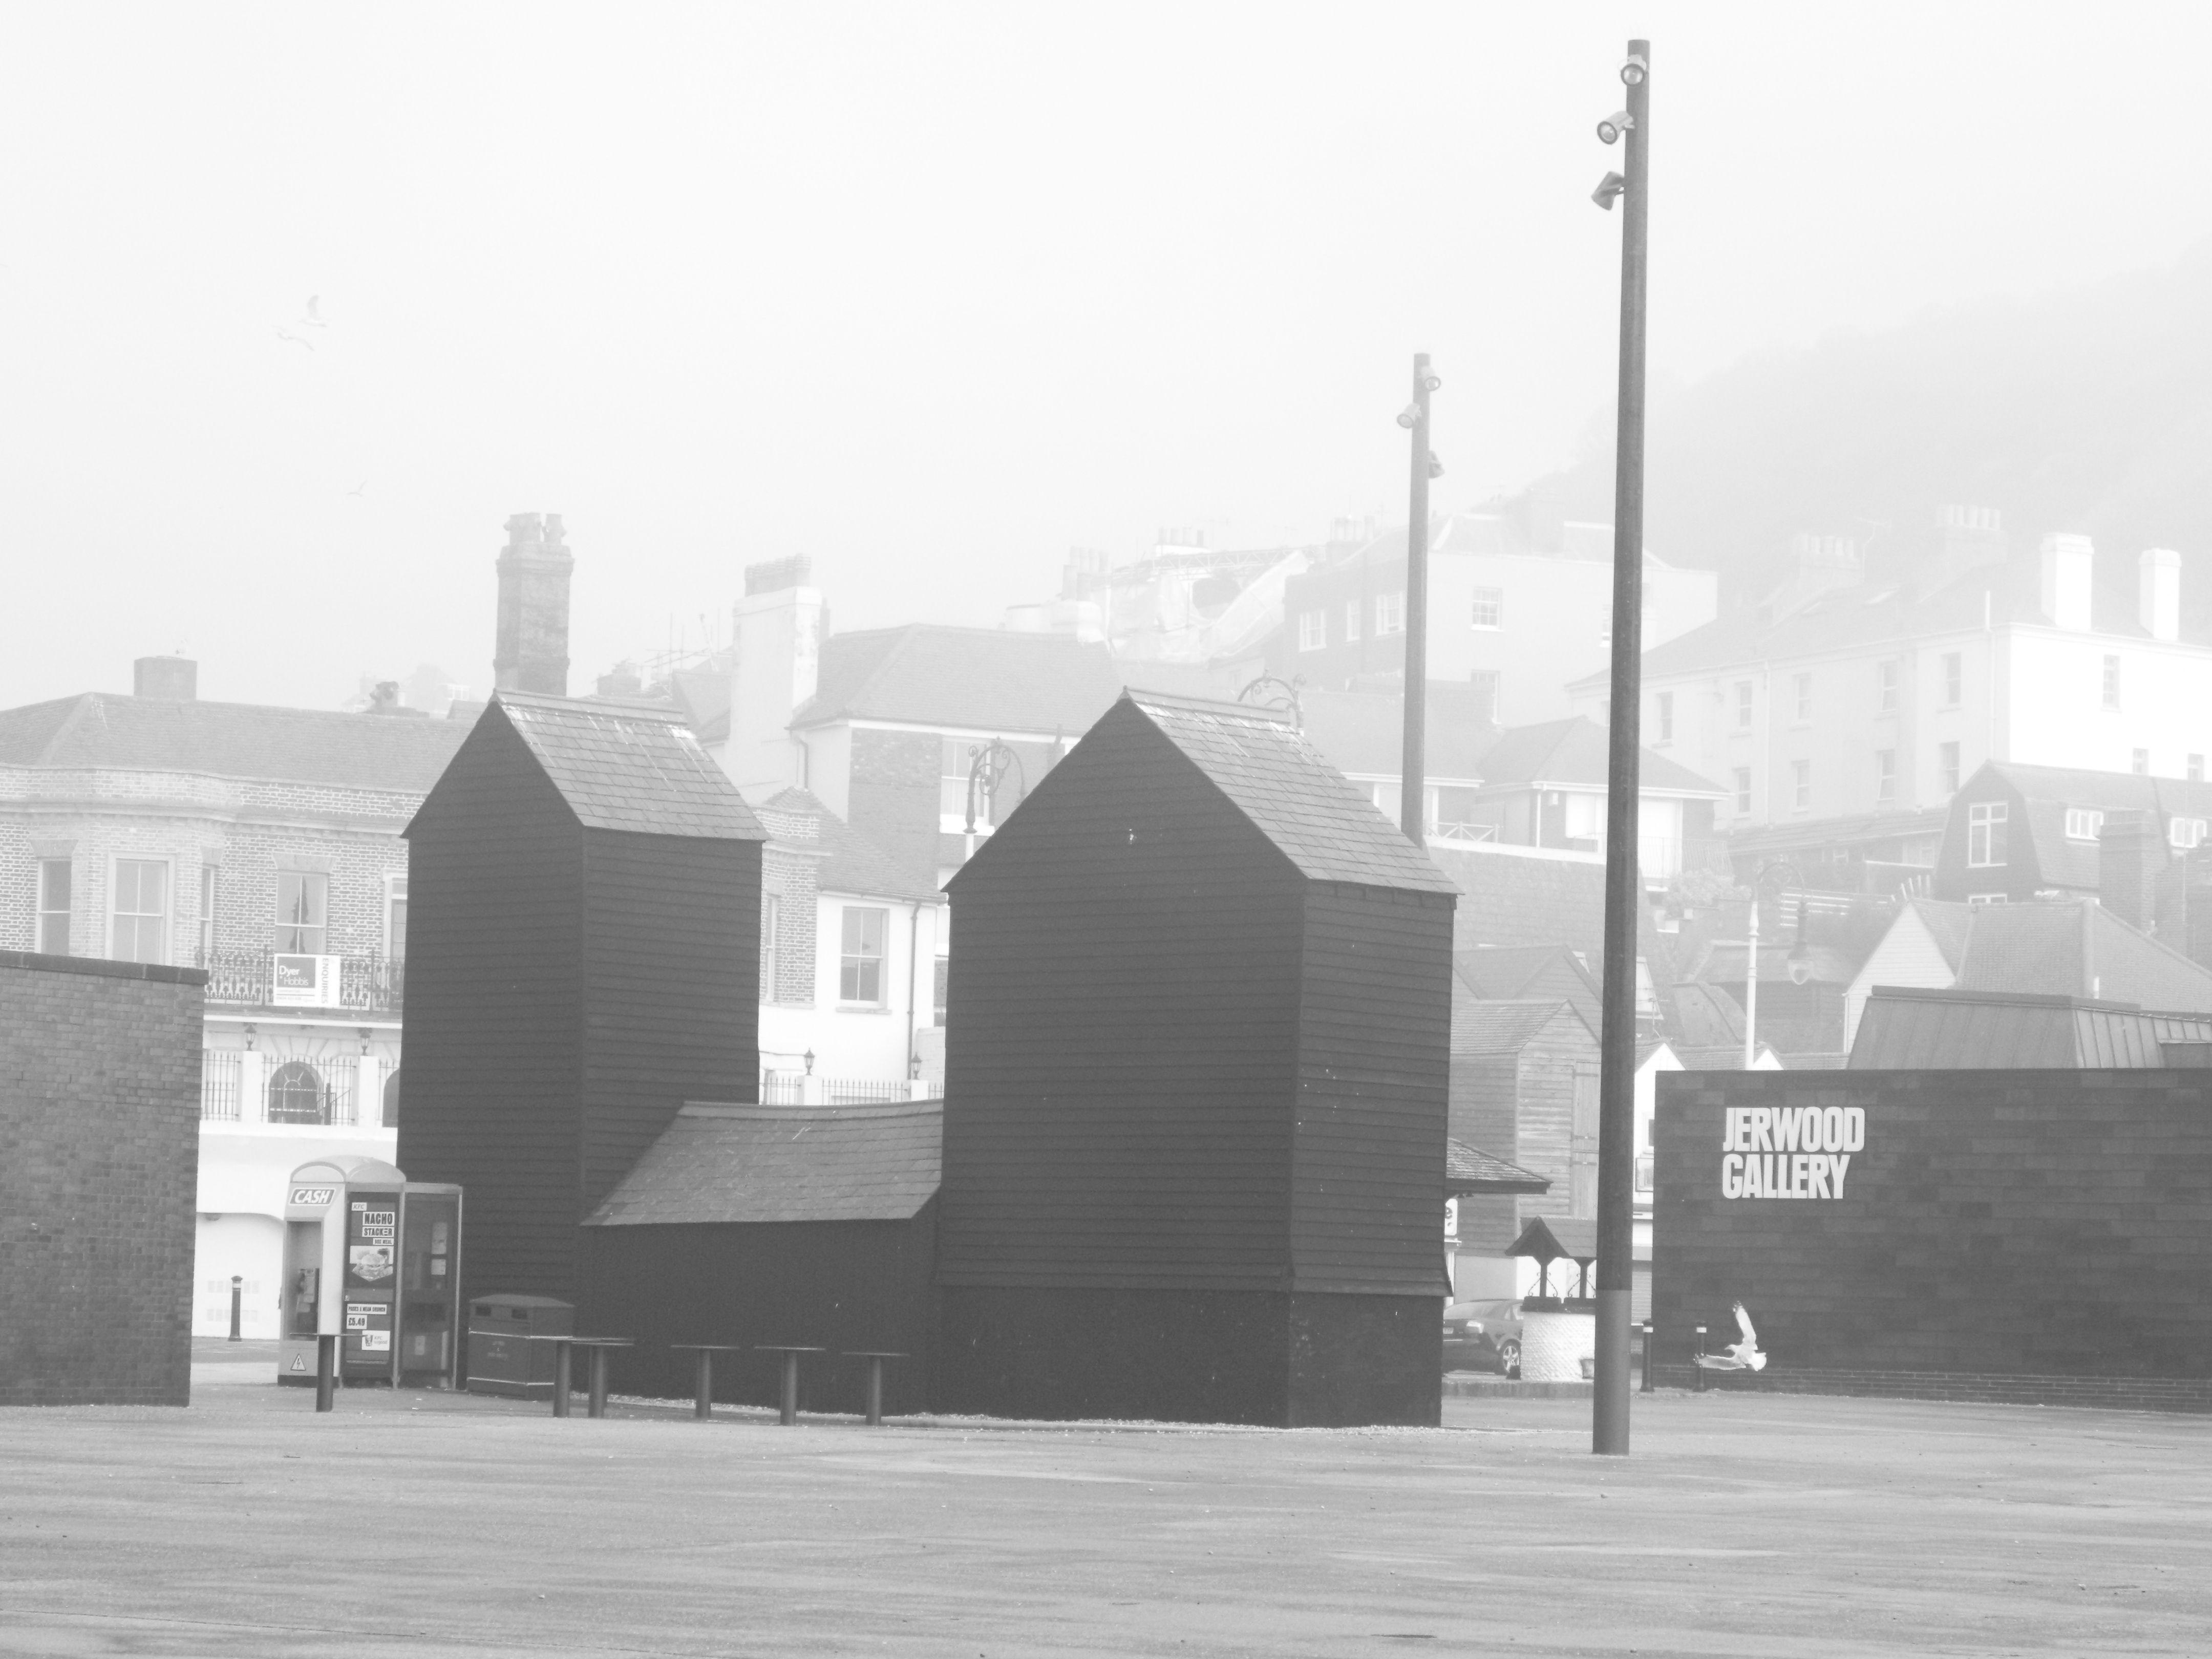 The Jerwood Gallery, Hastings